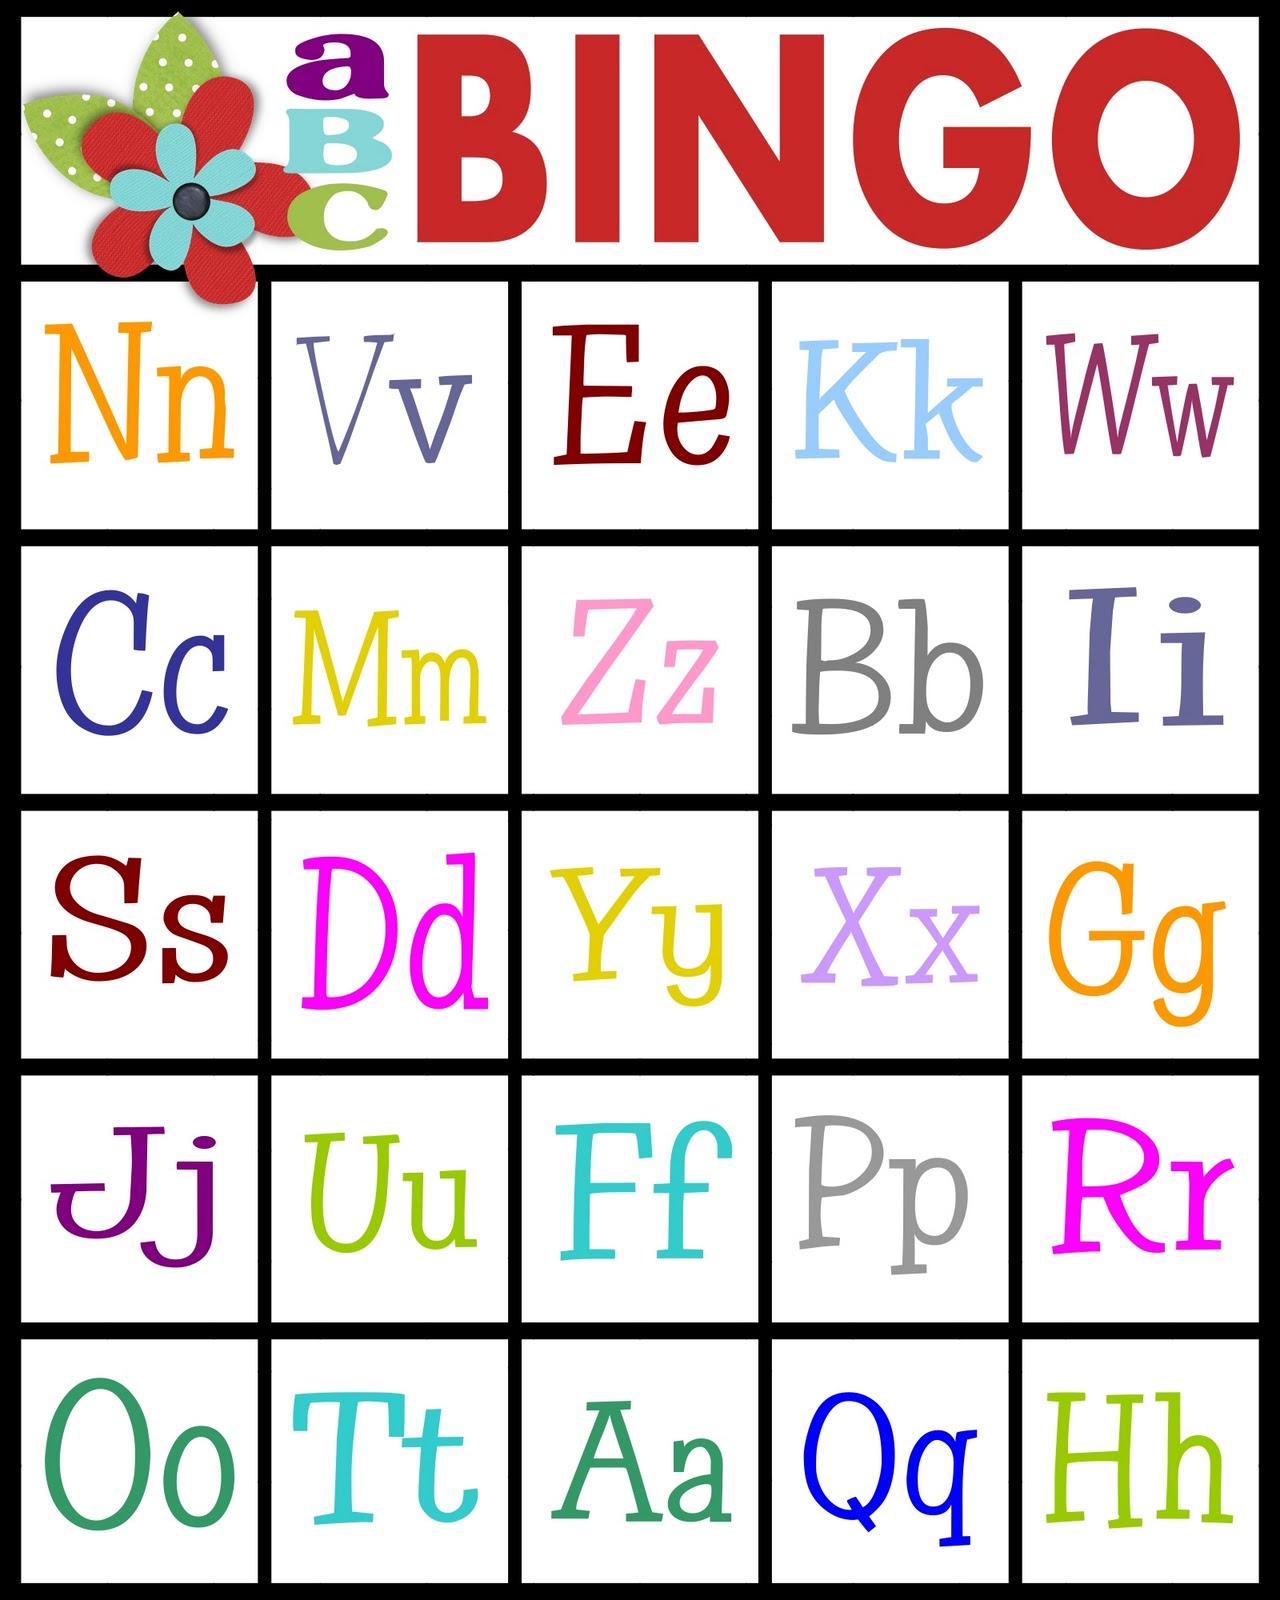 Sassy Sanctuary: Abc's Bingo- Free Printable!